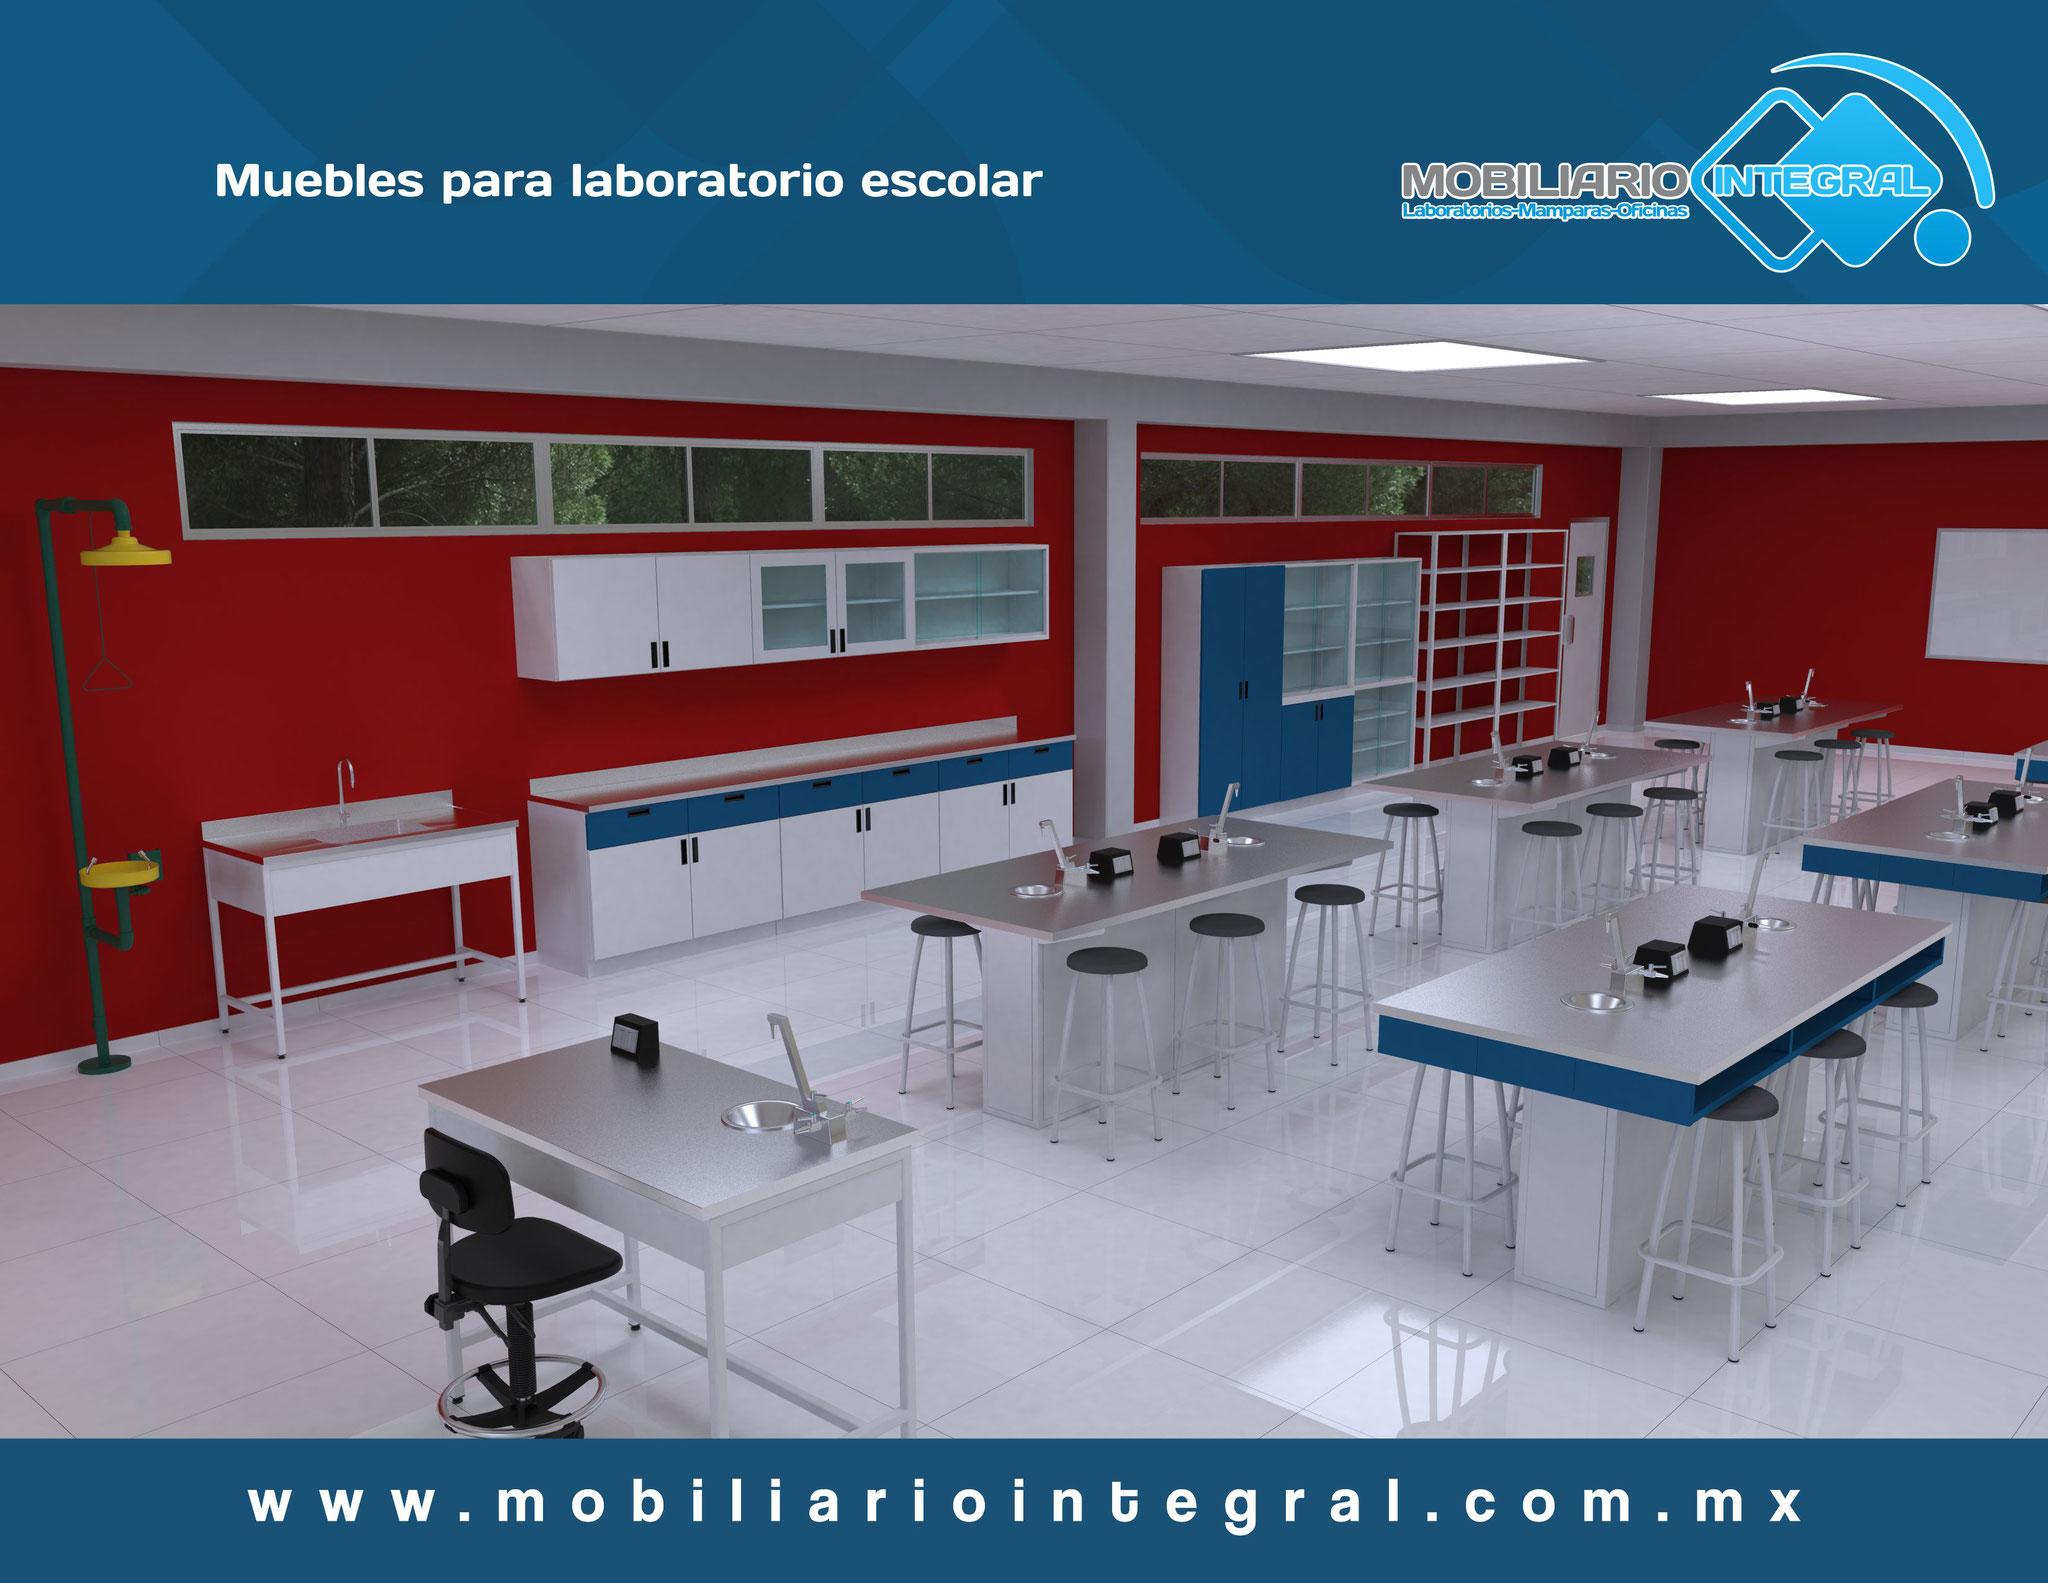 Muebles para laboratorio escolar Durango